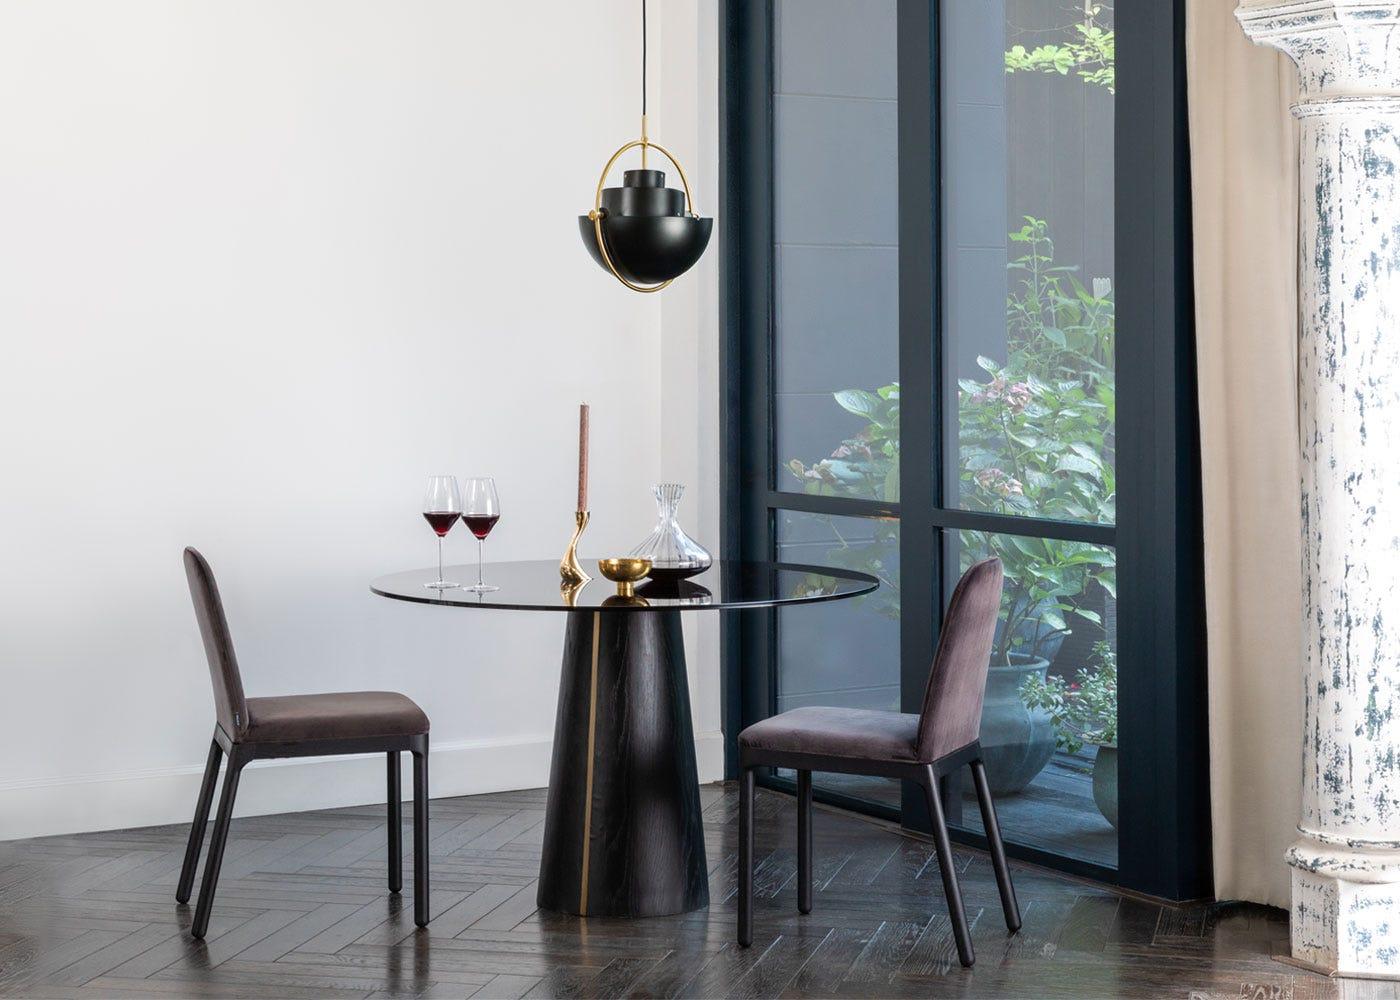 As shown: Totem pedestal dining table, Ellie dining chairs, Gubi Multi-Lite pendant black.